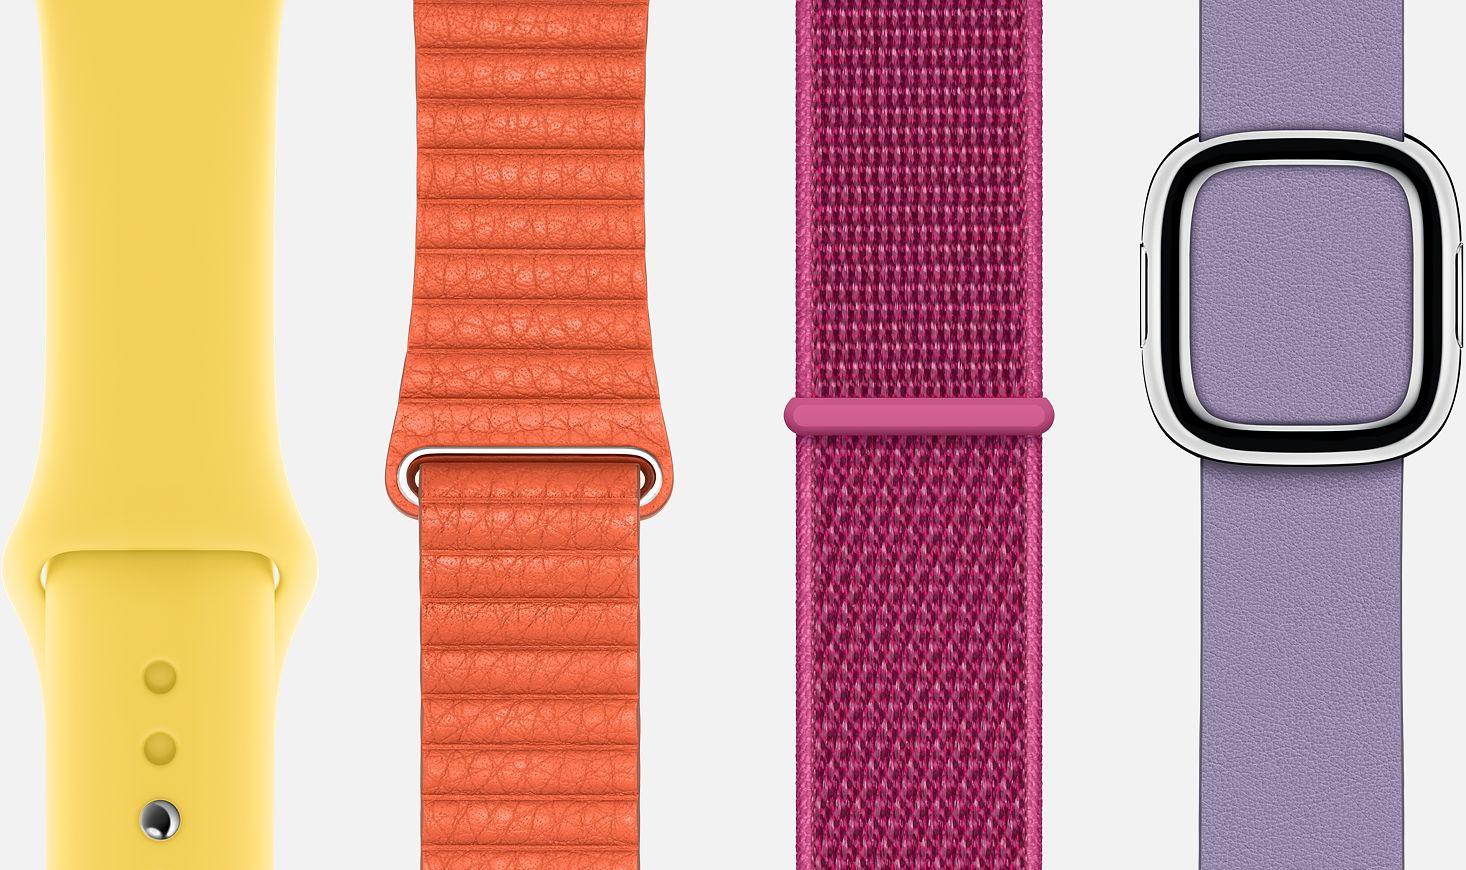 AppleWatch向けバンドが品薄に。新モデル発表イベントに向けたラインナップ刷新の対応か